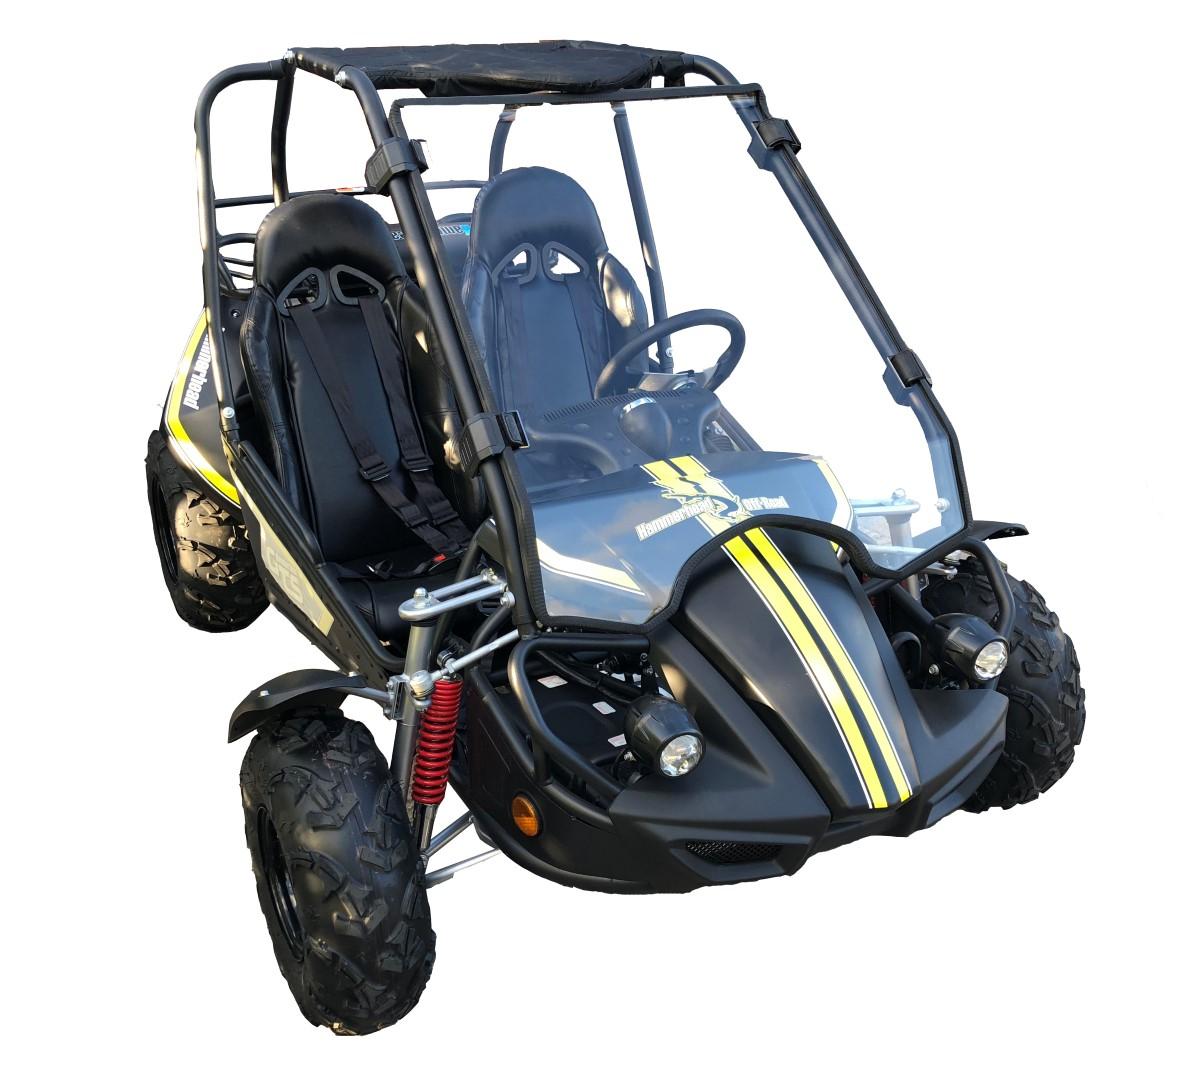 Frame Accessories | Storm Buggies on hammerhead gts 150 wheels, hammerhead 80t wiring diagram, hammerhead gts 250 wiring diagram, hammerhead gts 150 parts,